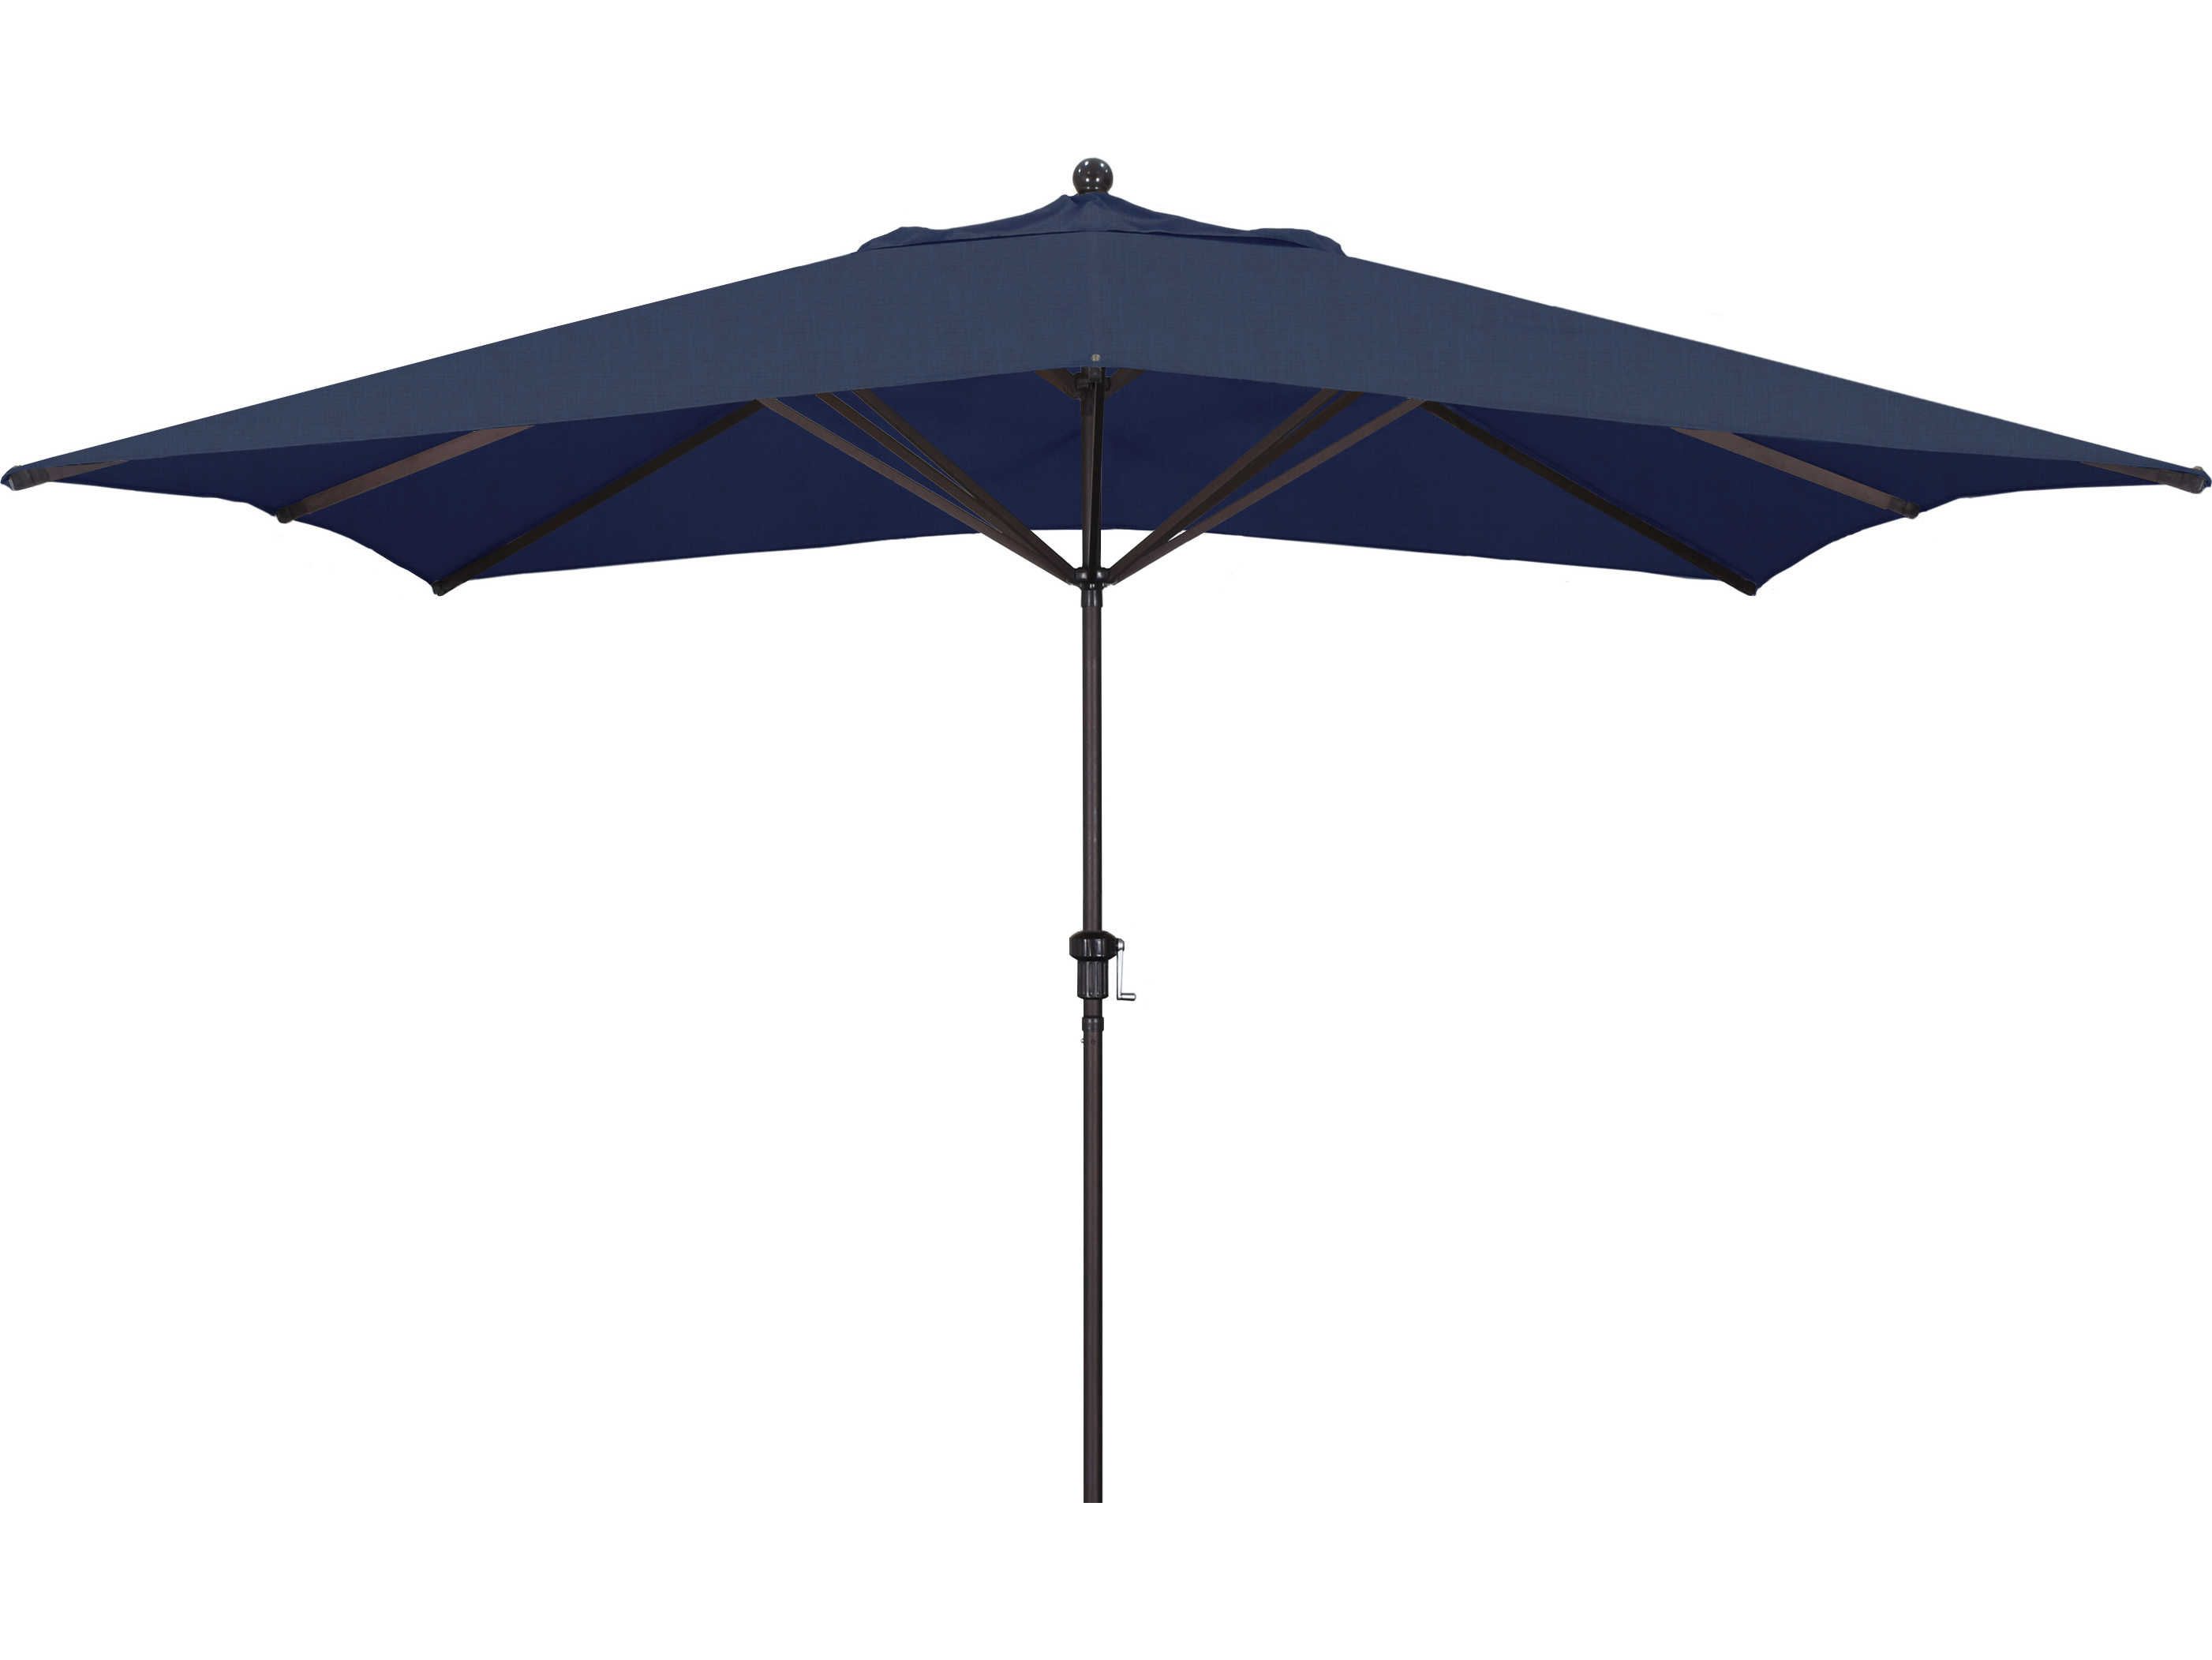 California Umbrella Tahoe Series 11 Foot Rectangular